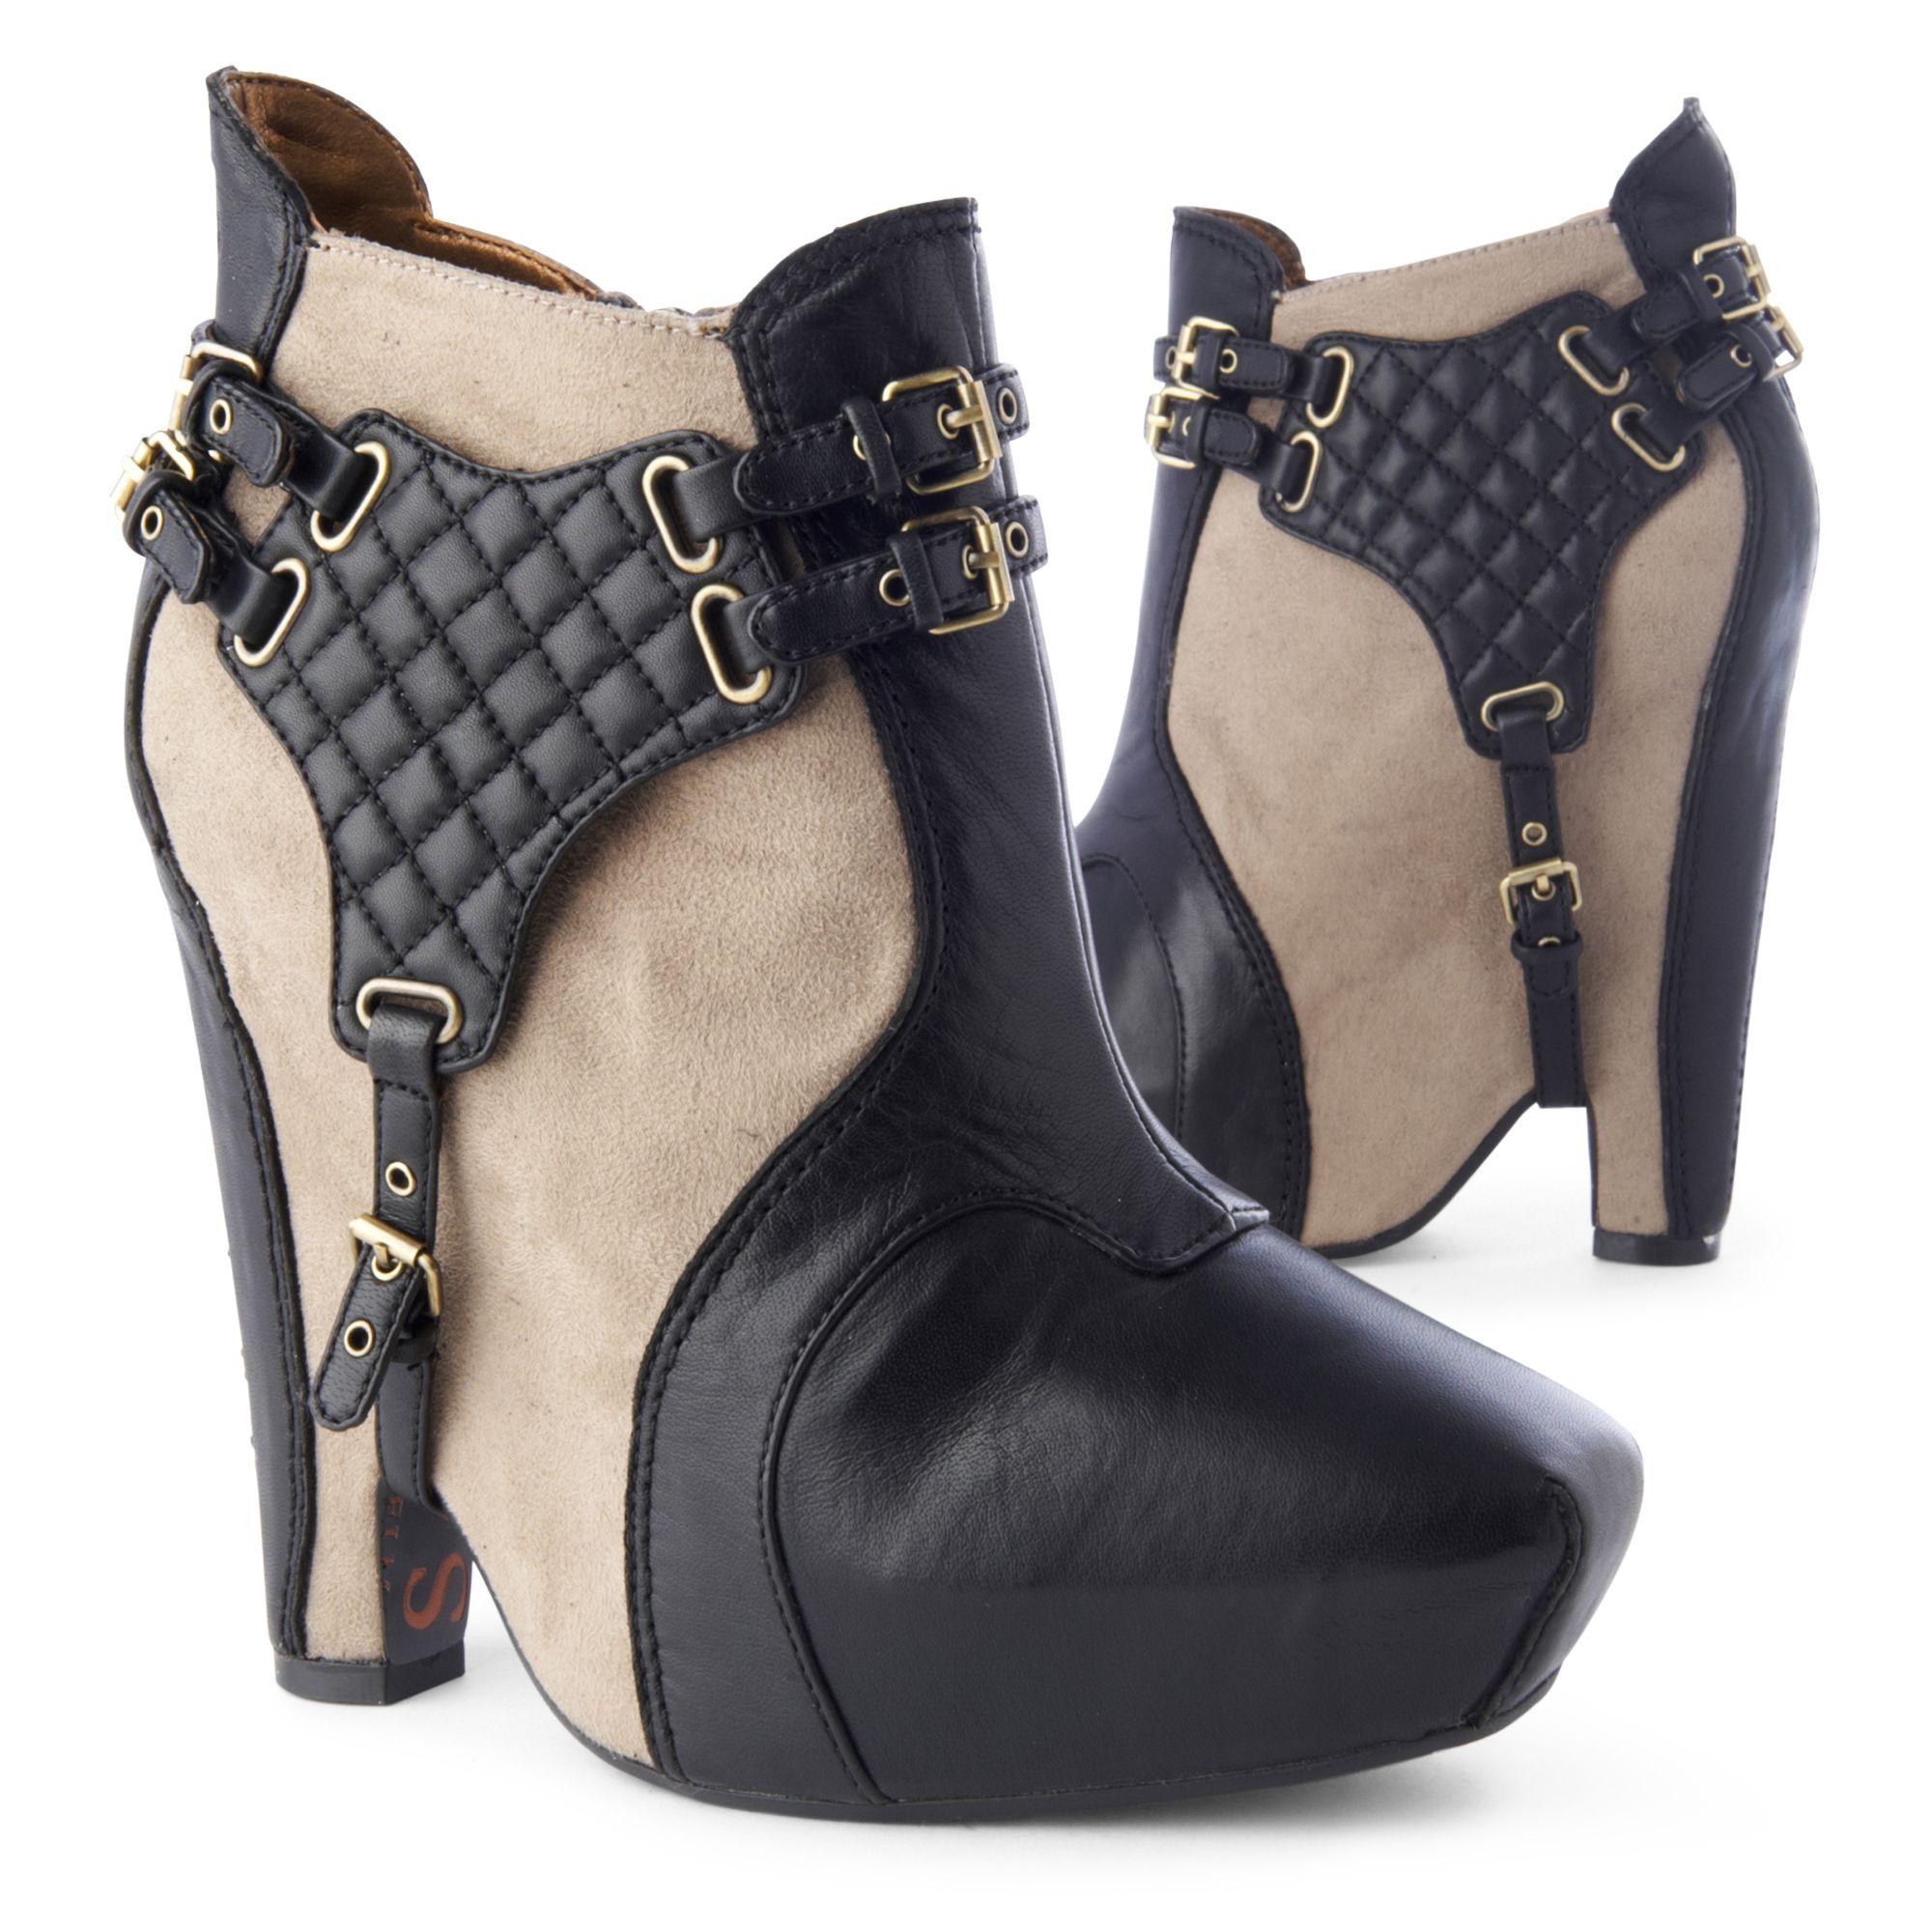 8e6d6e717546 Sam Edelman Zoe Platform Ankle Boots in Black - Lyst